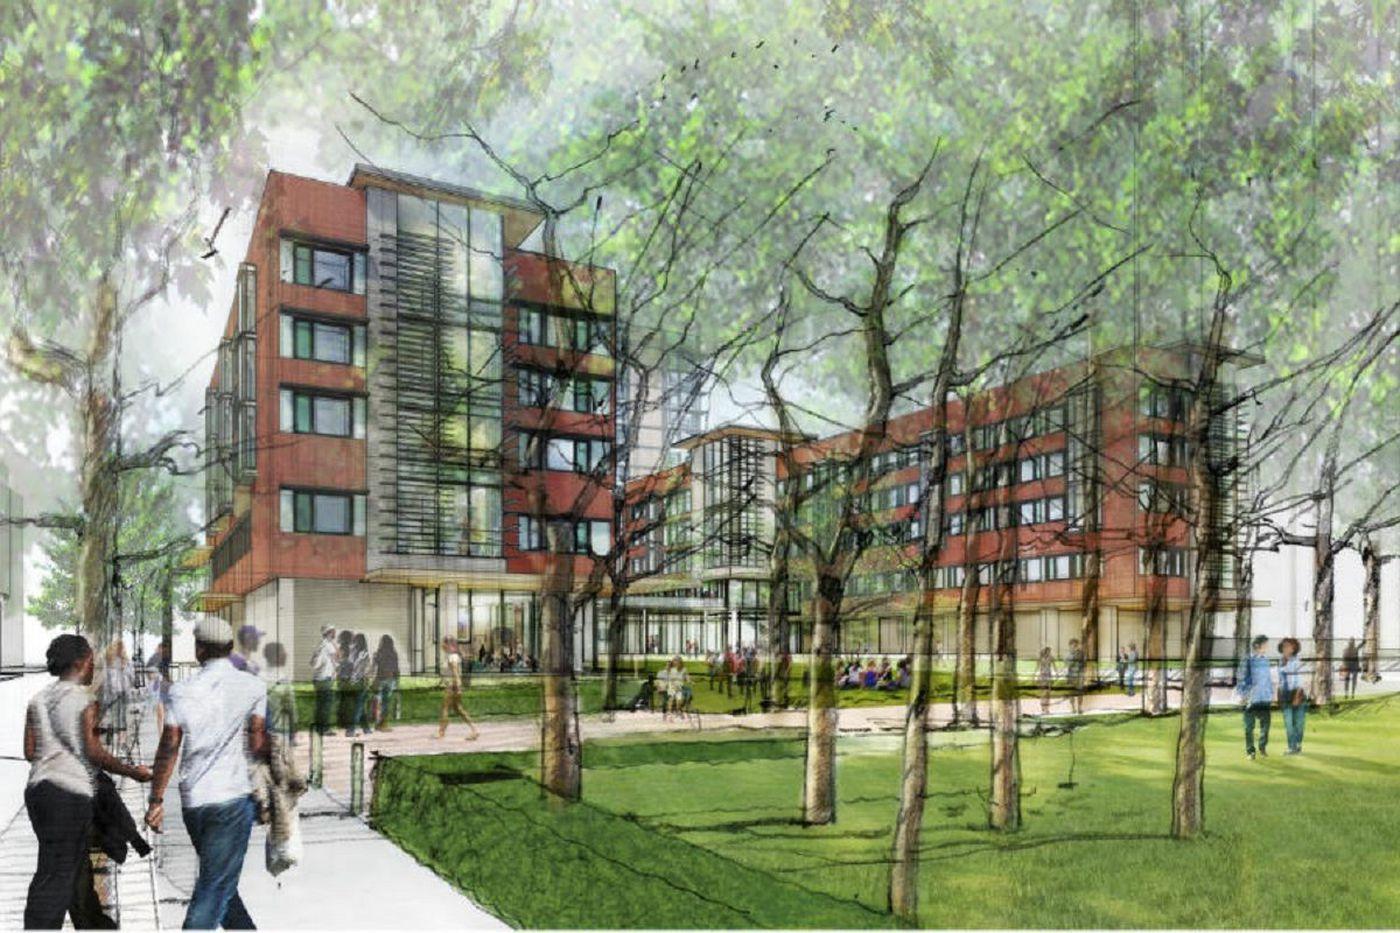 Penn to build more undergrad housing near 40th & Walnut